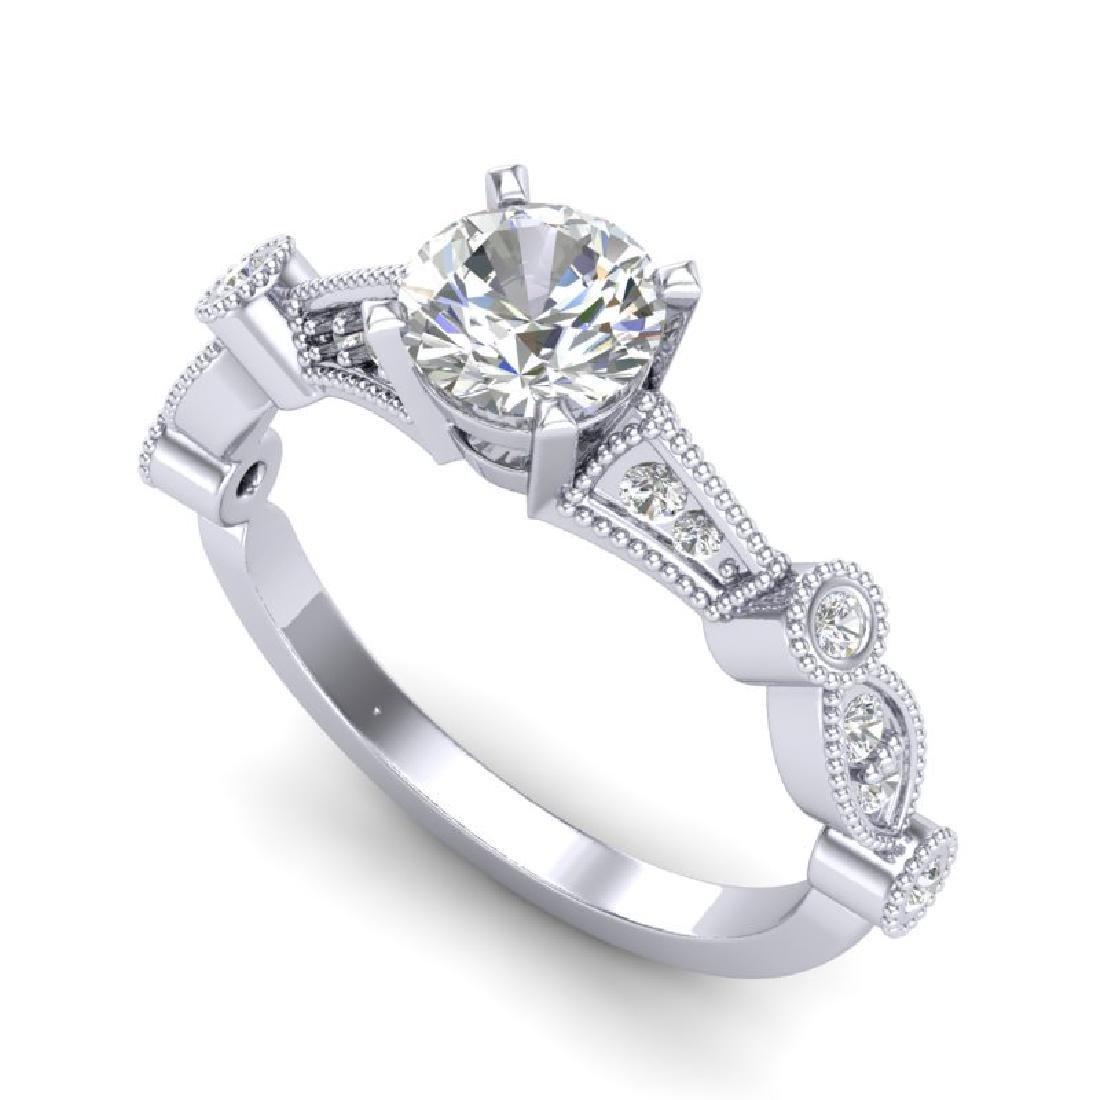 1.03 CTW VS/SI Diamond Art Deco Ring 18K White Gold